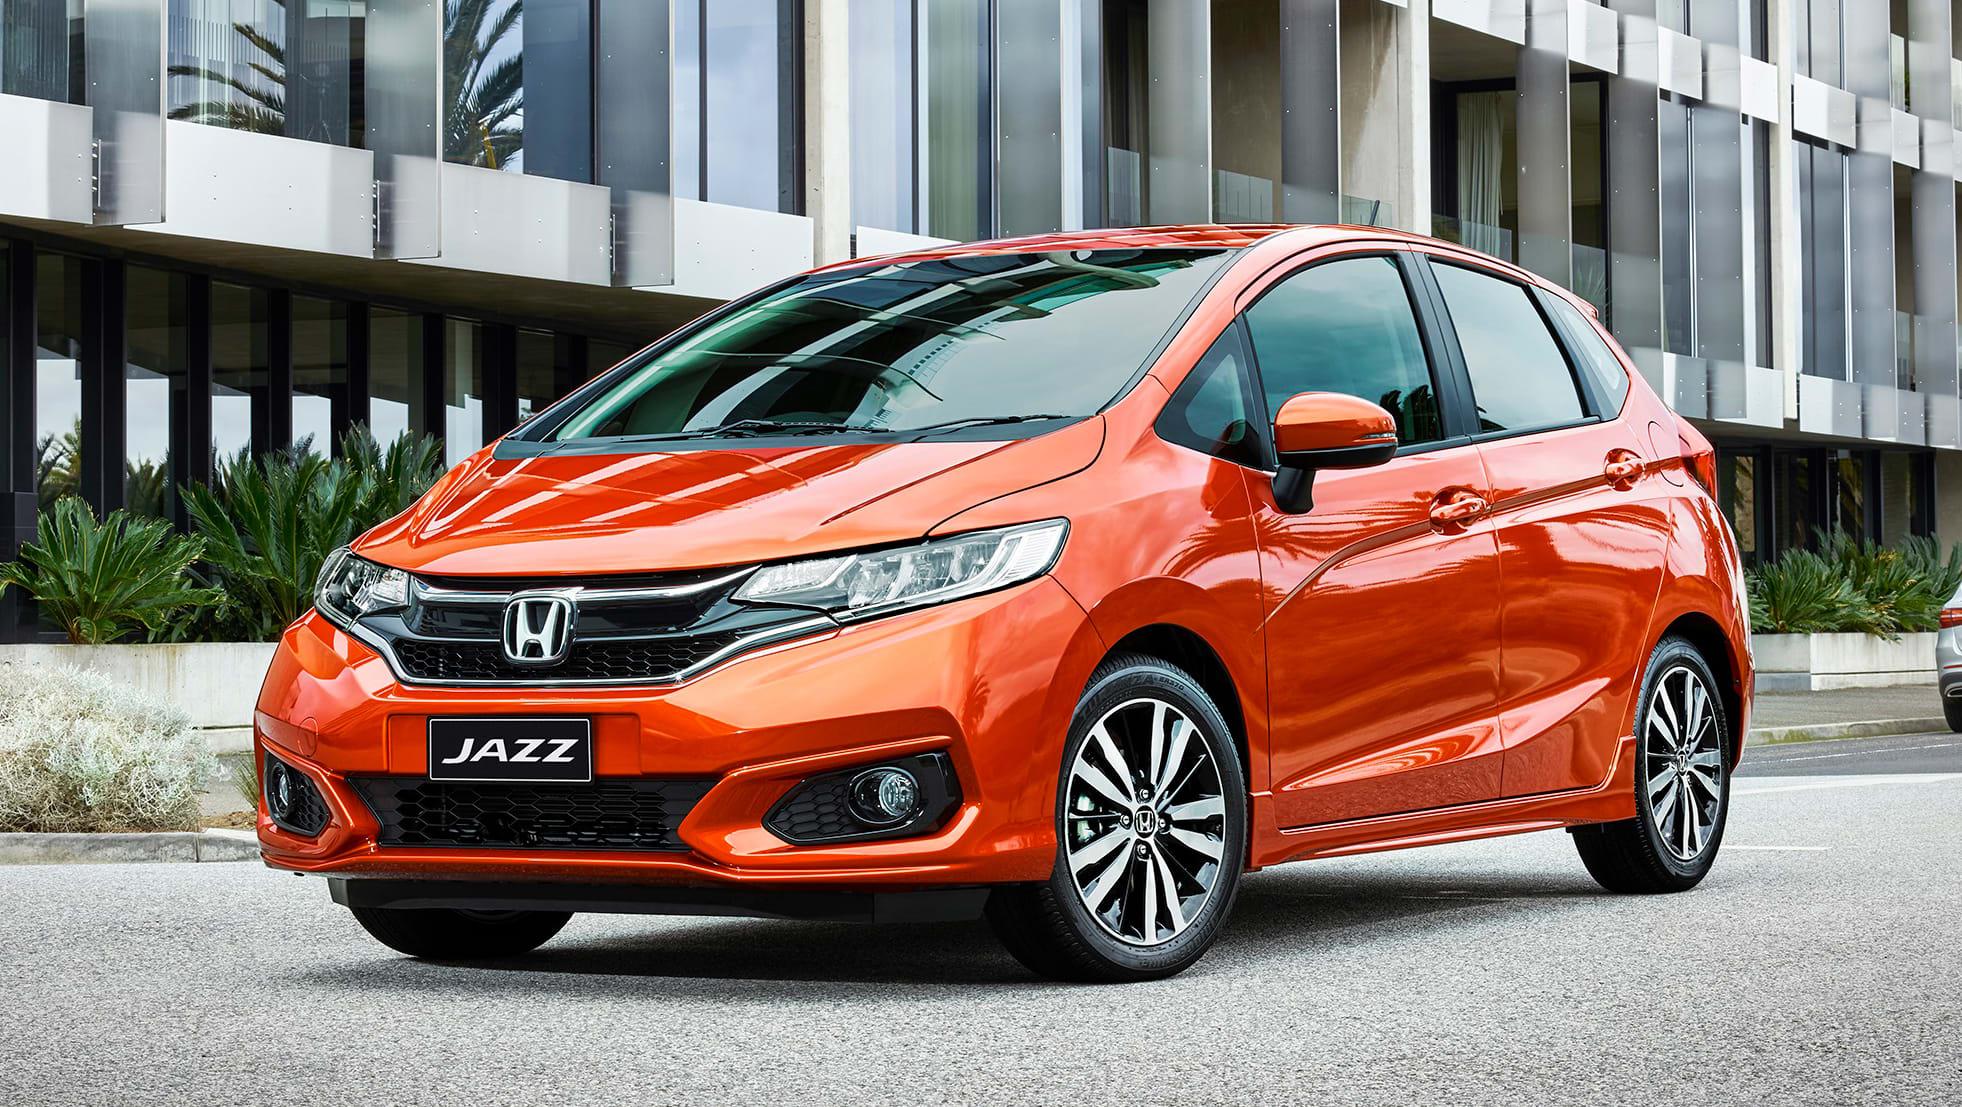 Honda Jazz VTi-L 2018 Review: Snapshot